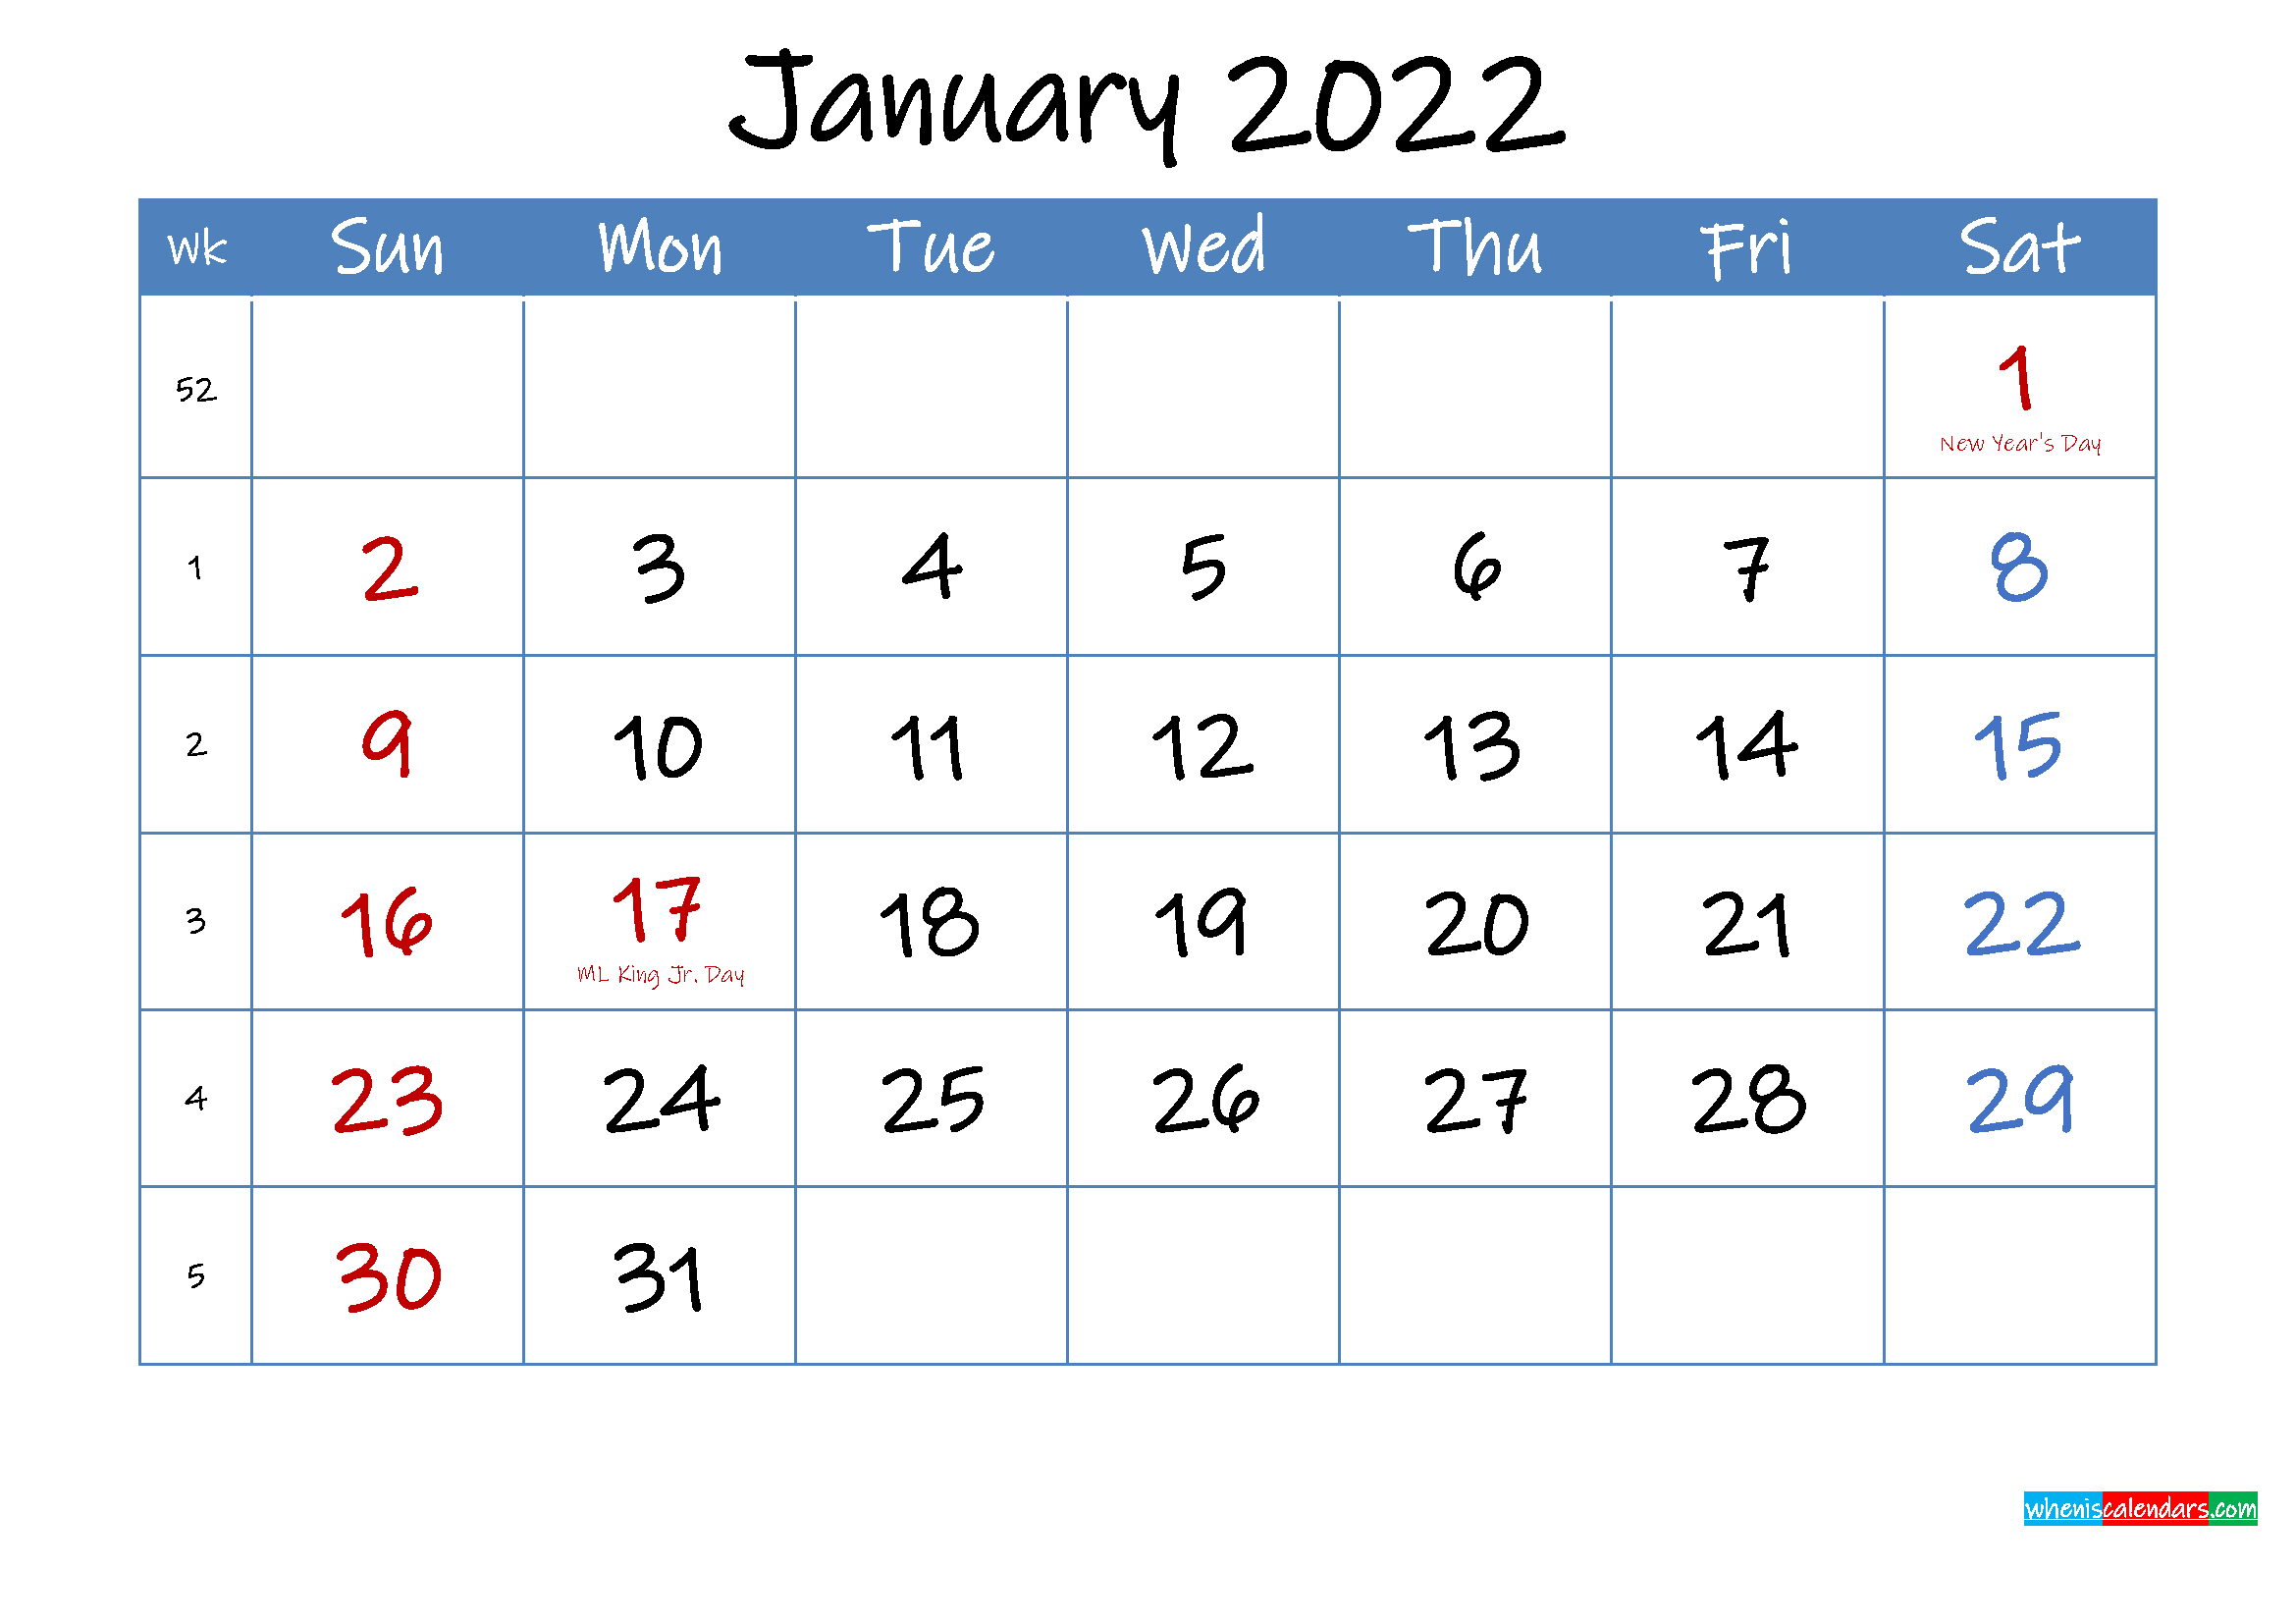 Printable January 2022 Calendar Word - Template Ink22M13 in January 2022 Printable Calendar Photo